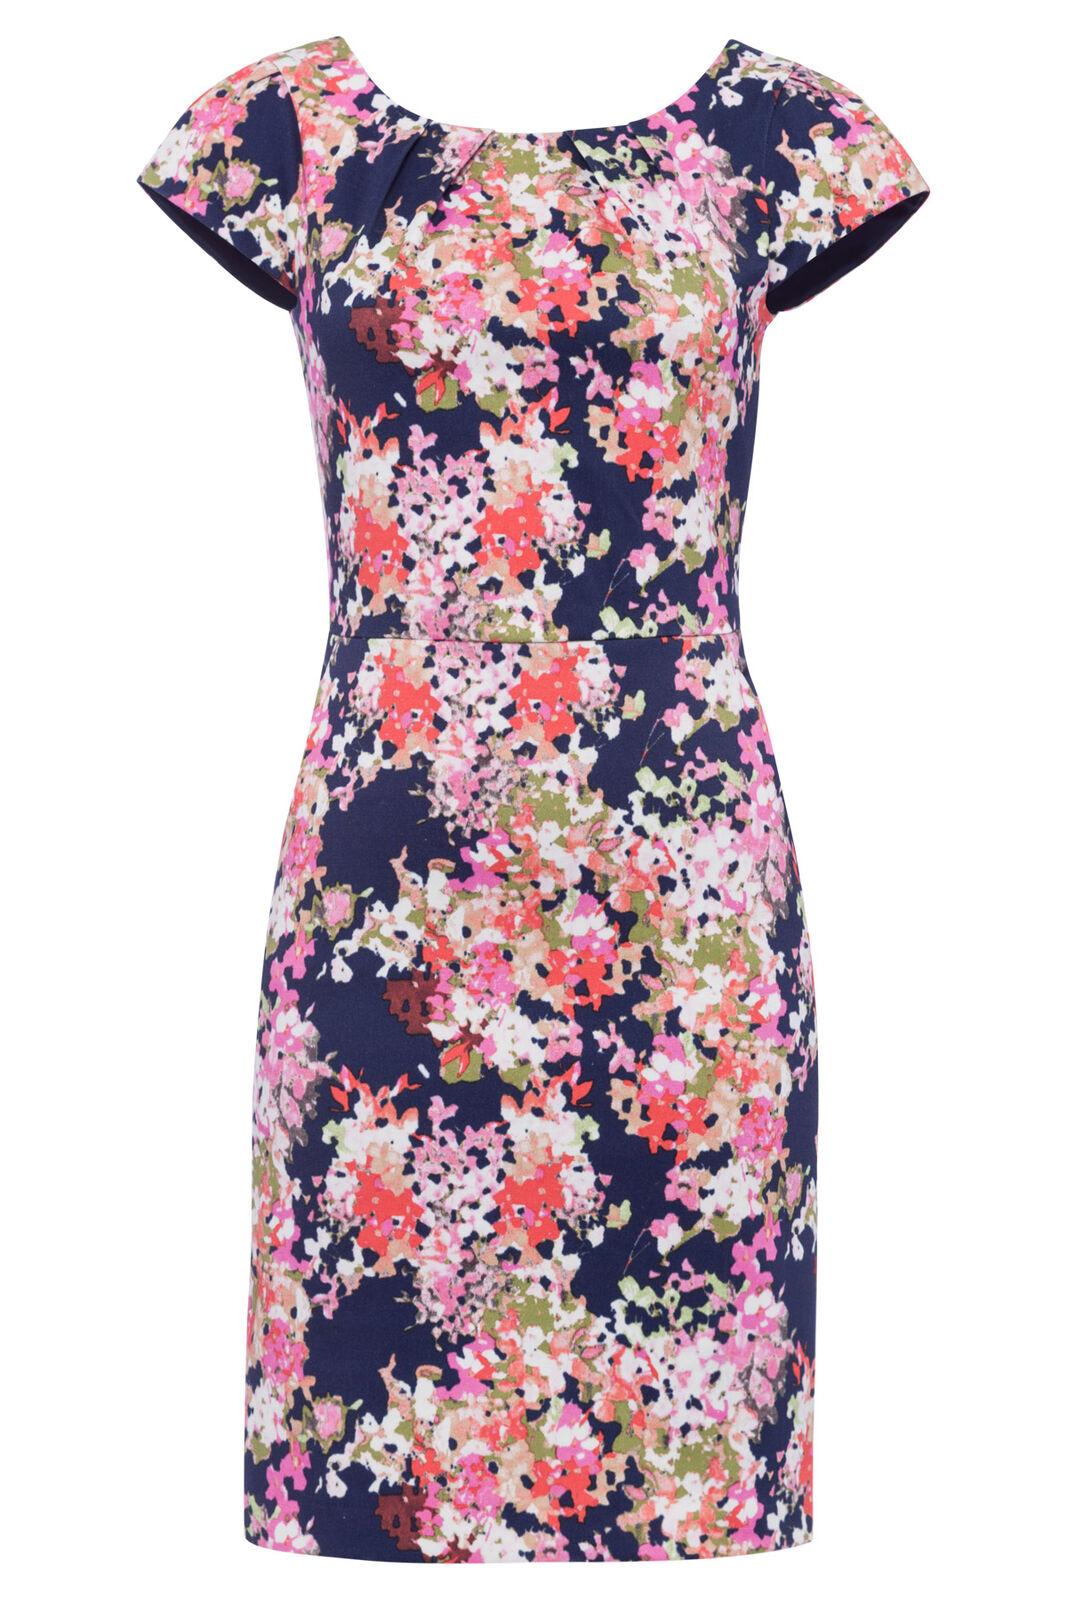 MORE&MORE DAMEN Kleid 1-tlg. kurz NEU Größe 34 36